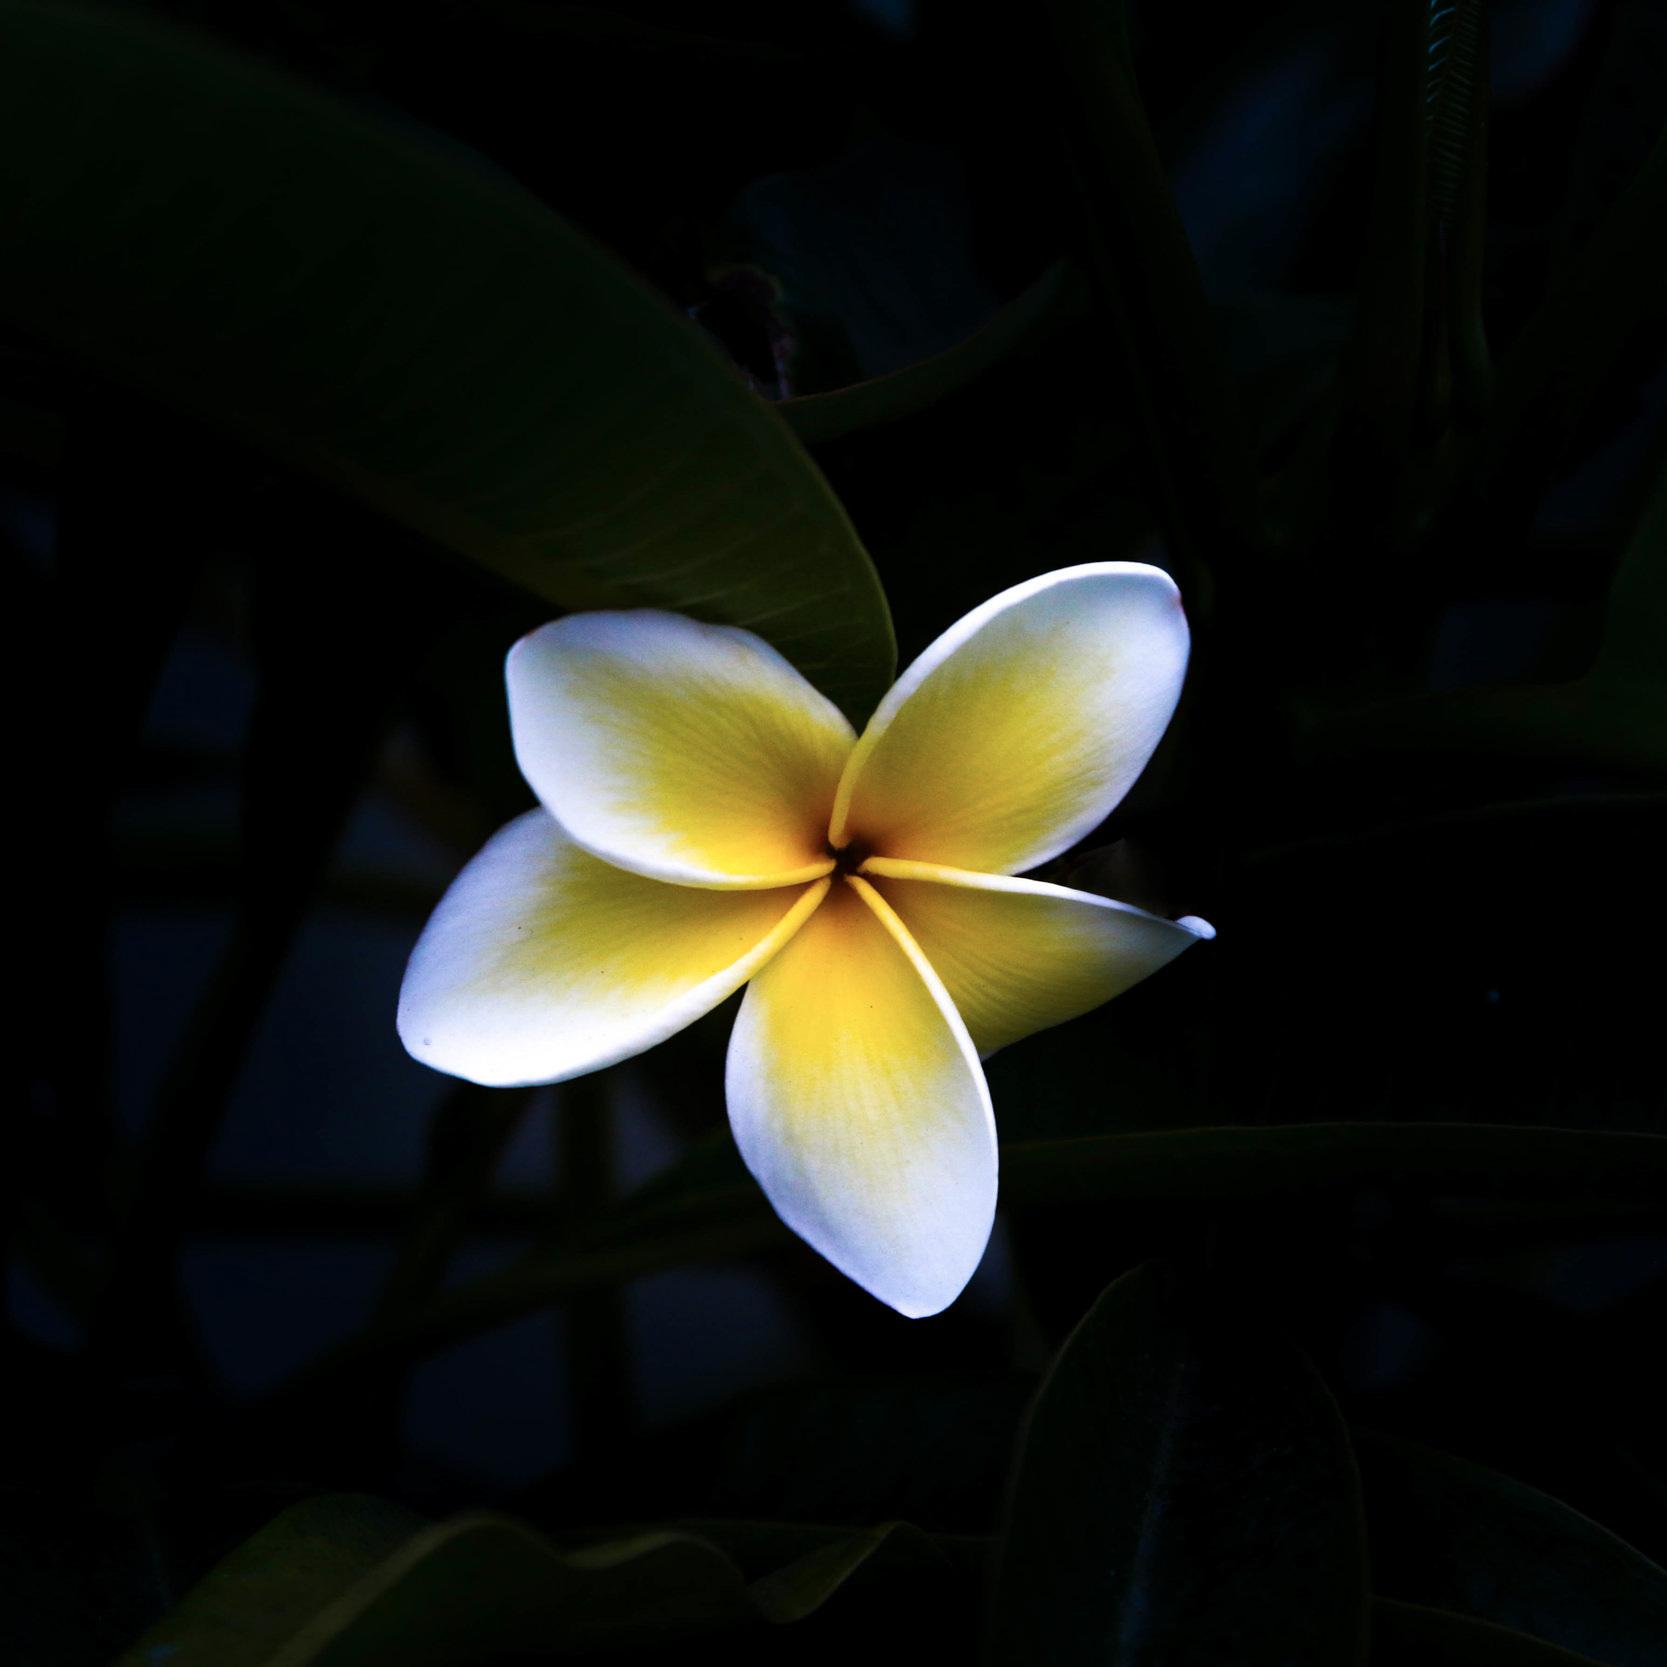 2 Fast-Casual Hawaiian Restaurants for sale! -